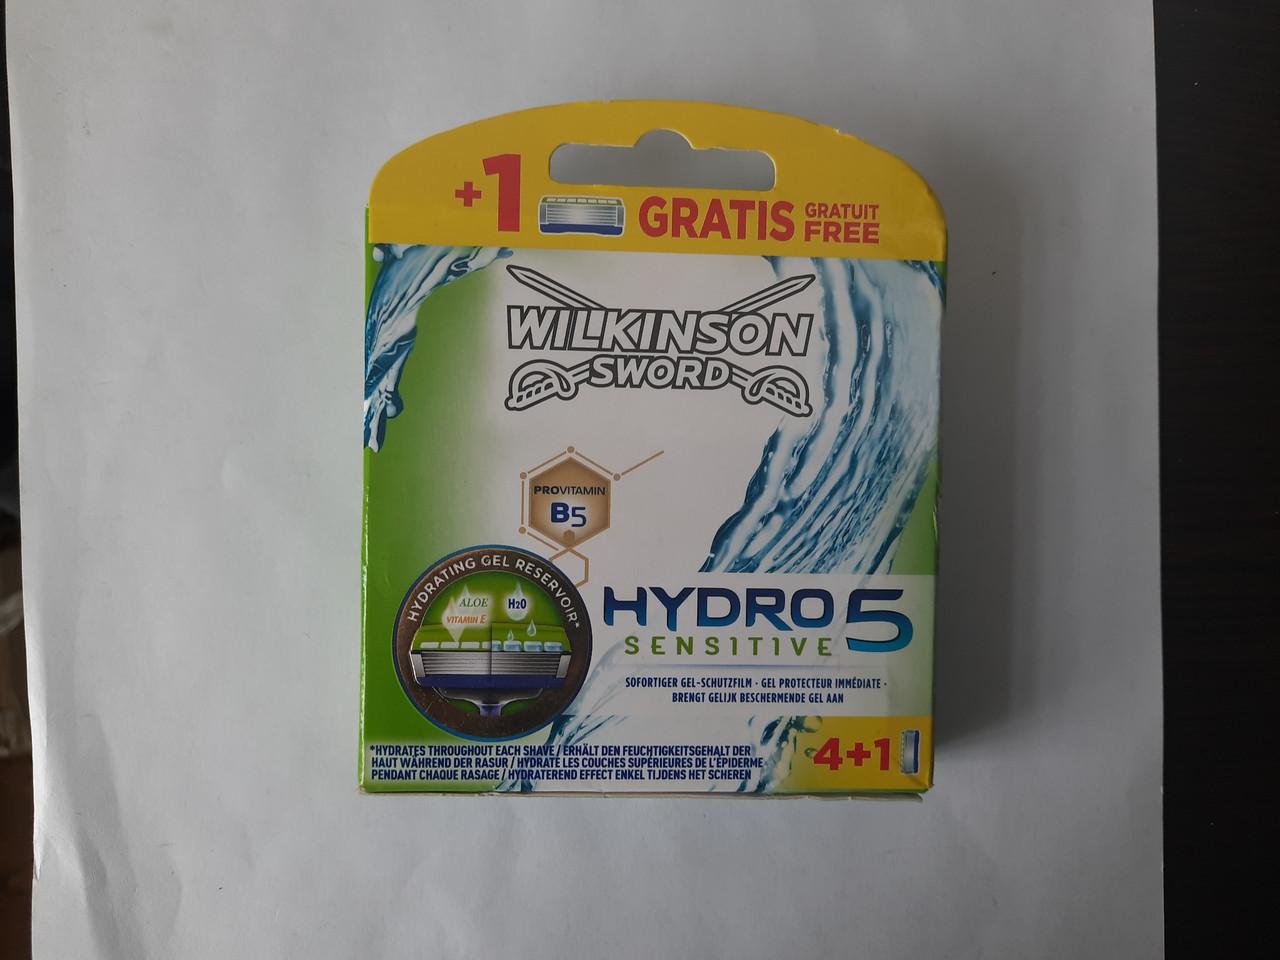 Кассеты Schick Wilkinson Sword  Hydro 5 Sensitive 4+1 шт. (Шик гидро 5 сенсетив)